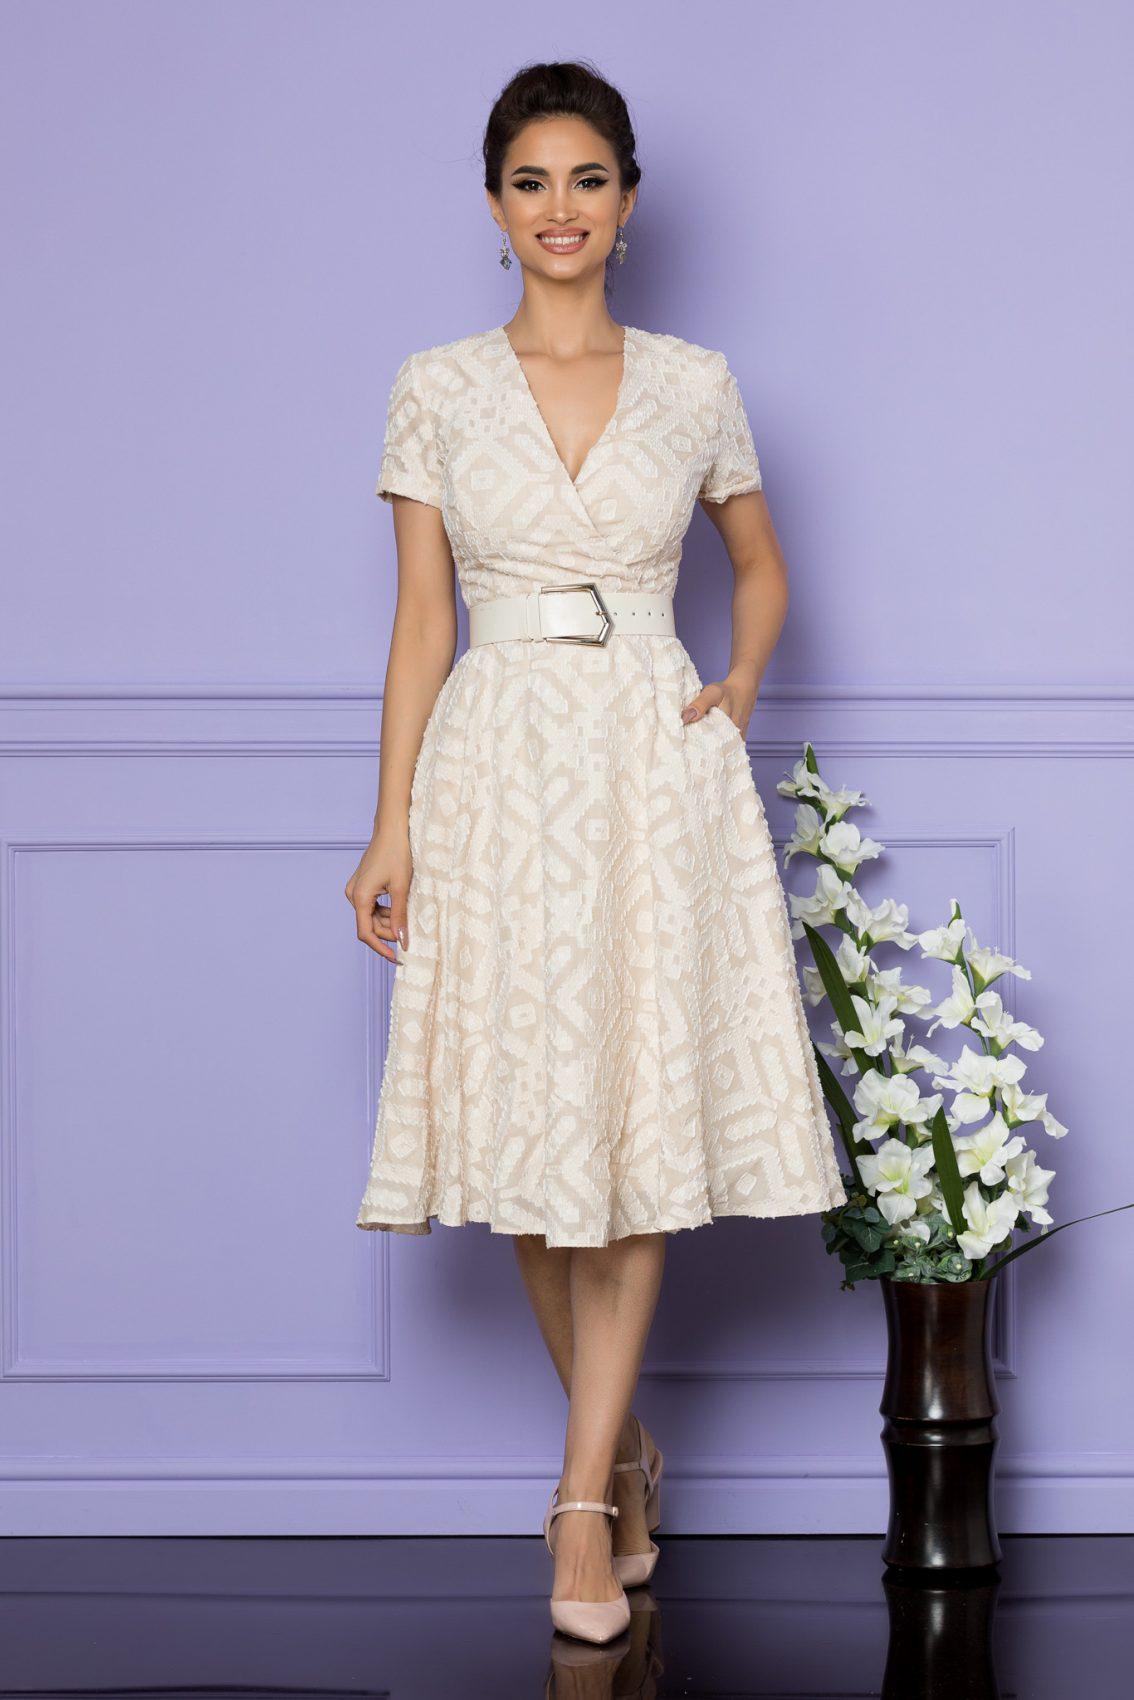 Nude Μίντι Κρουαζέ Φόρεμα Patricia A716 1